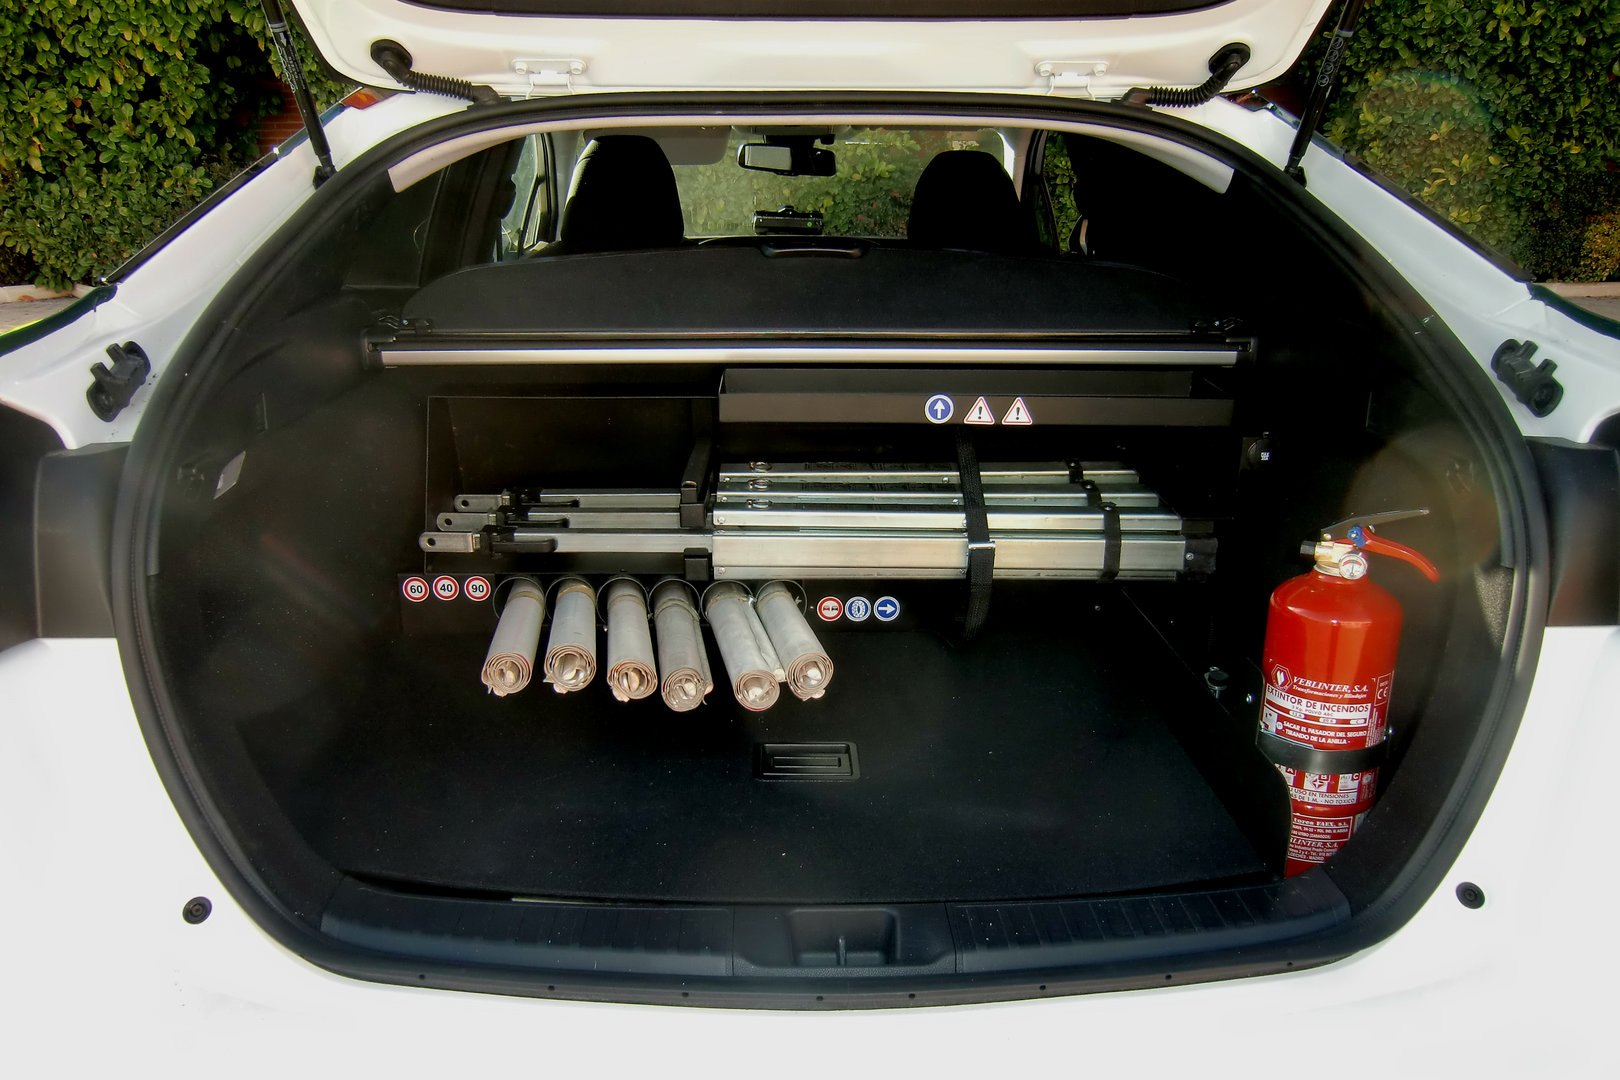 Toyota Prius Guardiacivil 3